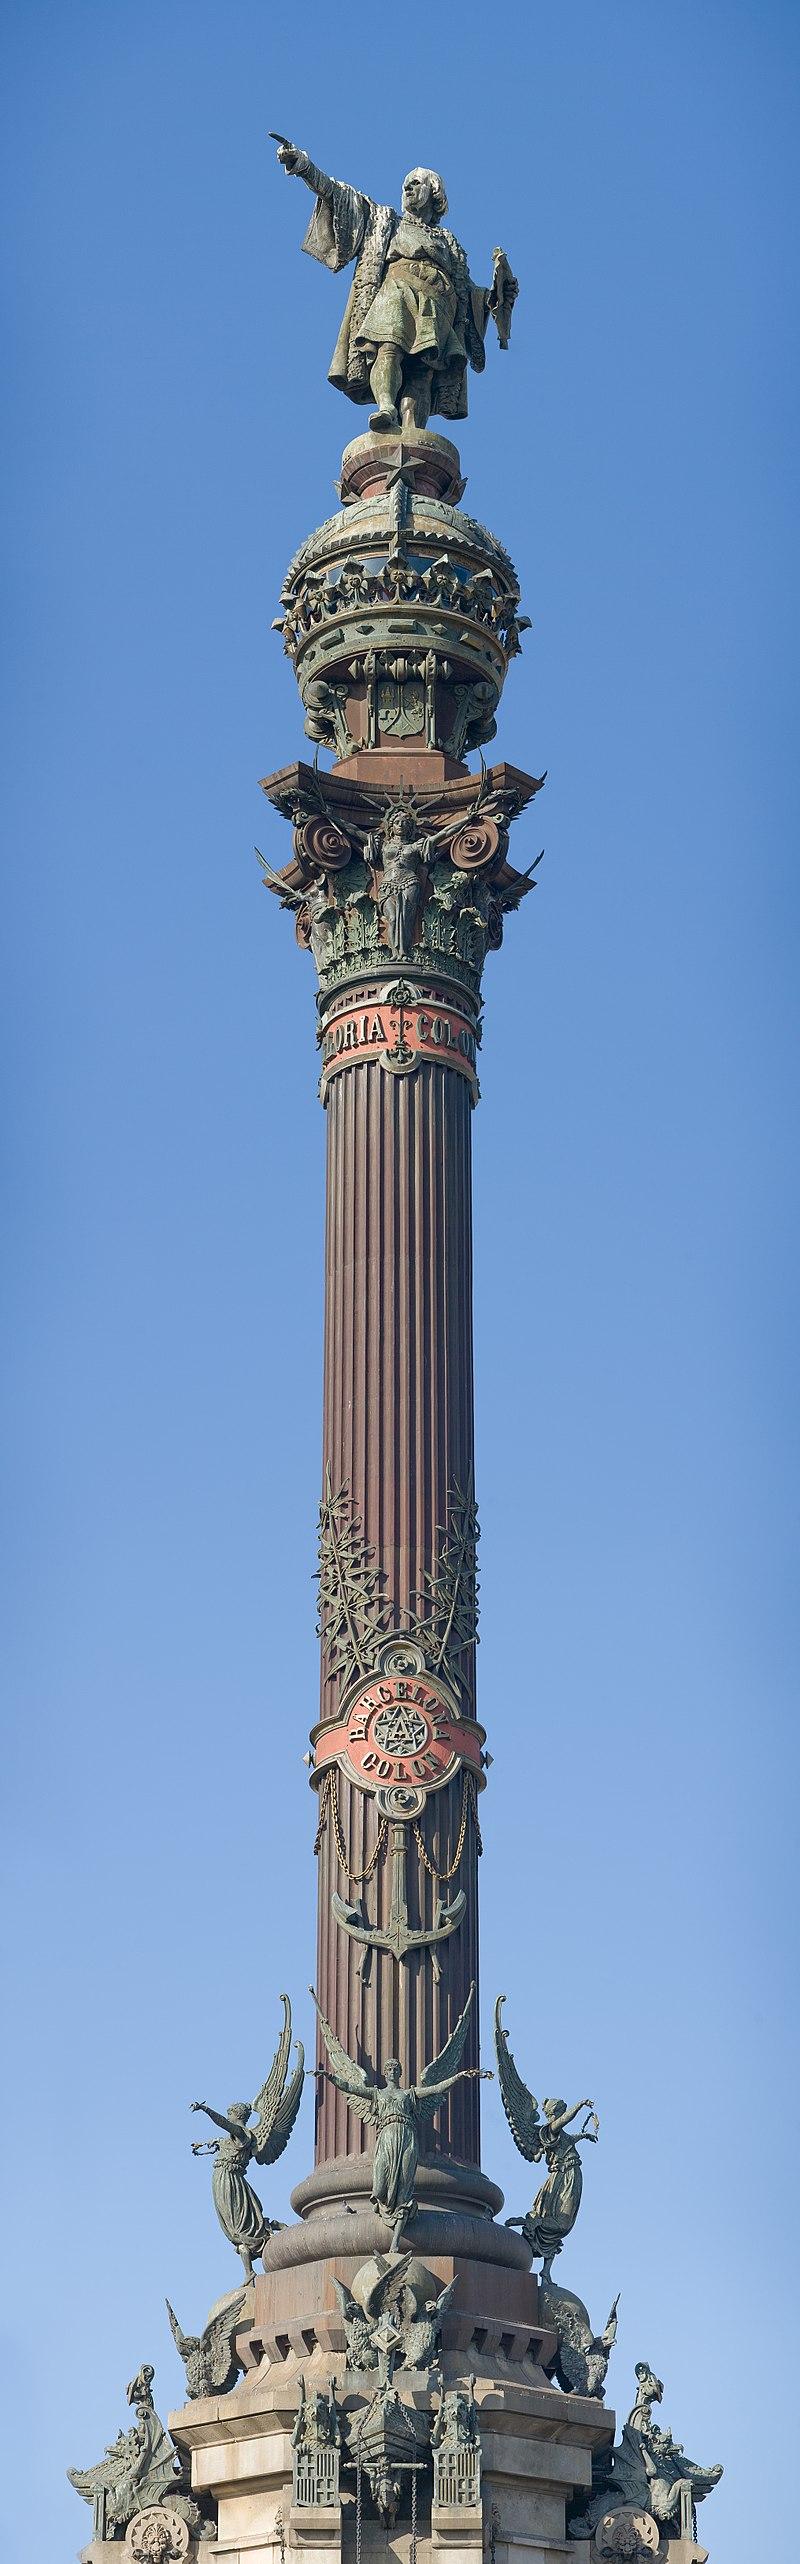 800px-Monument_a_Colom%2C_Barcelona%2C_Spain_-_Jan_07.jpg